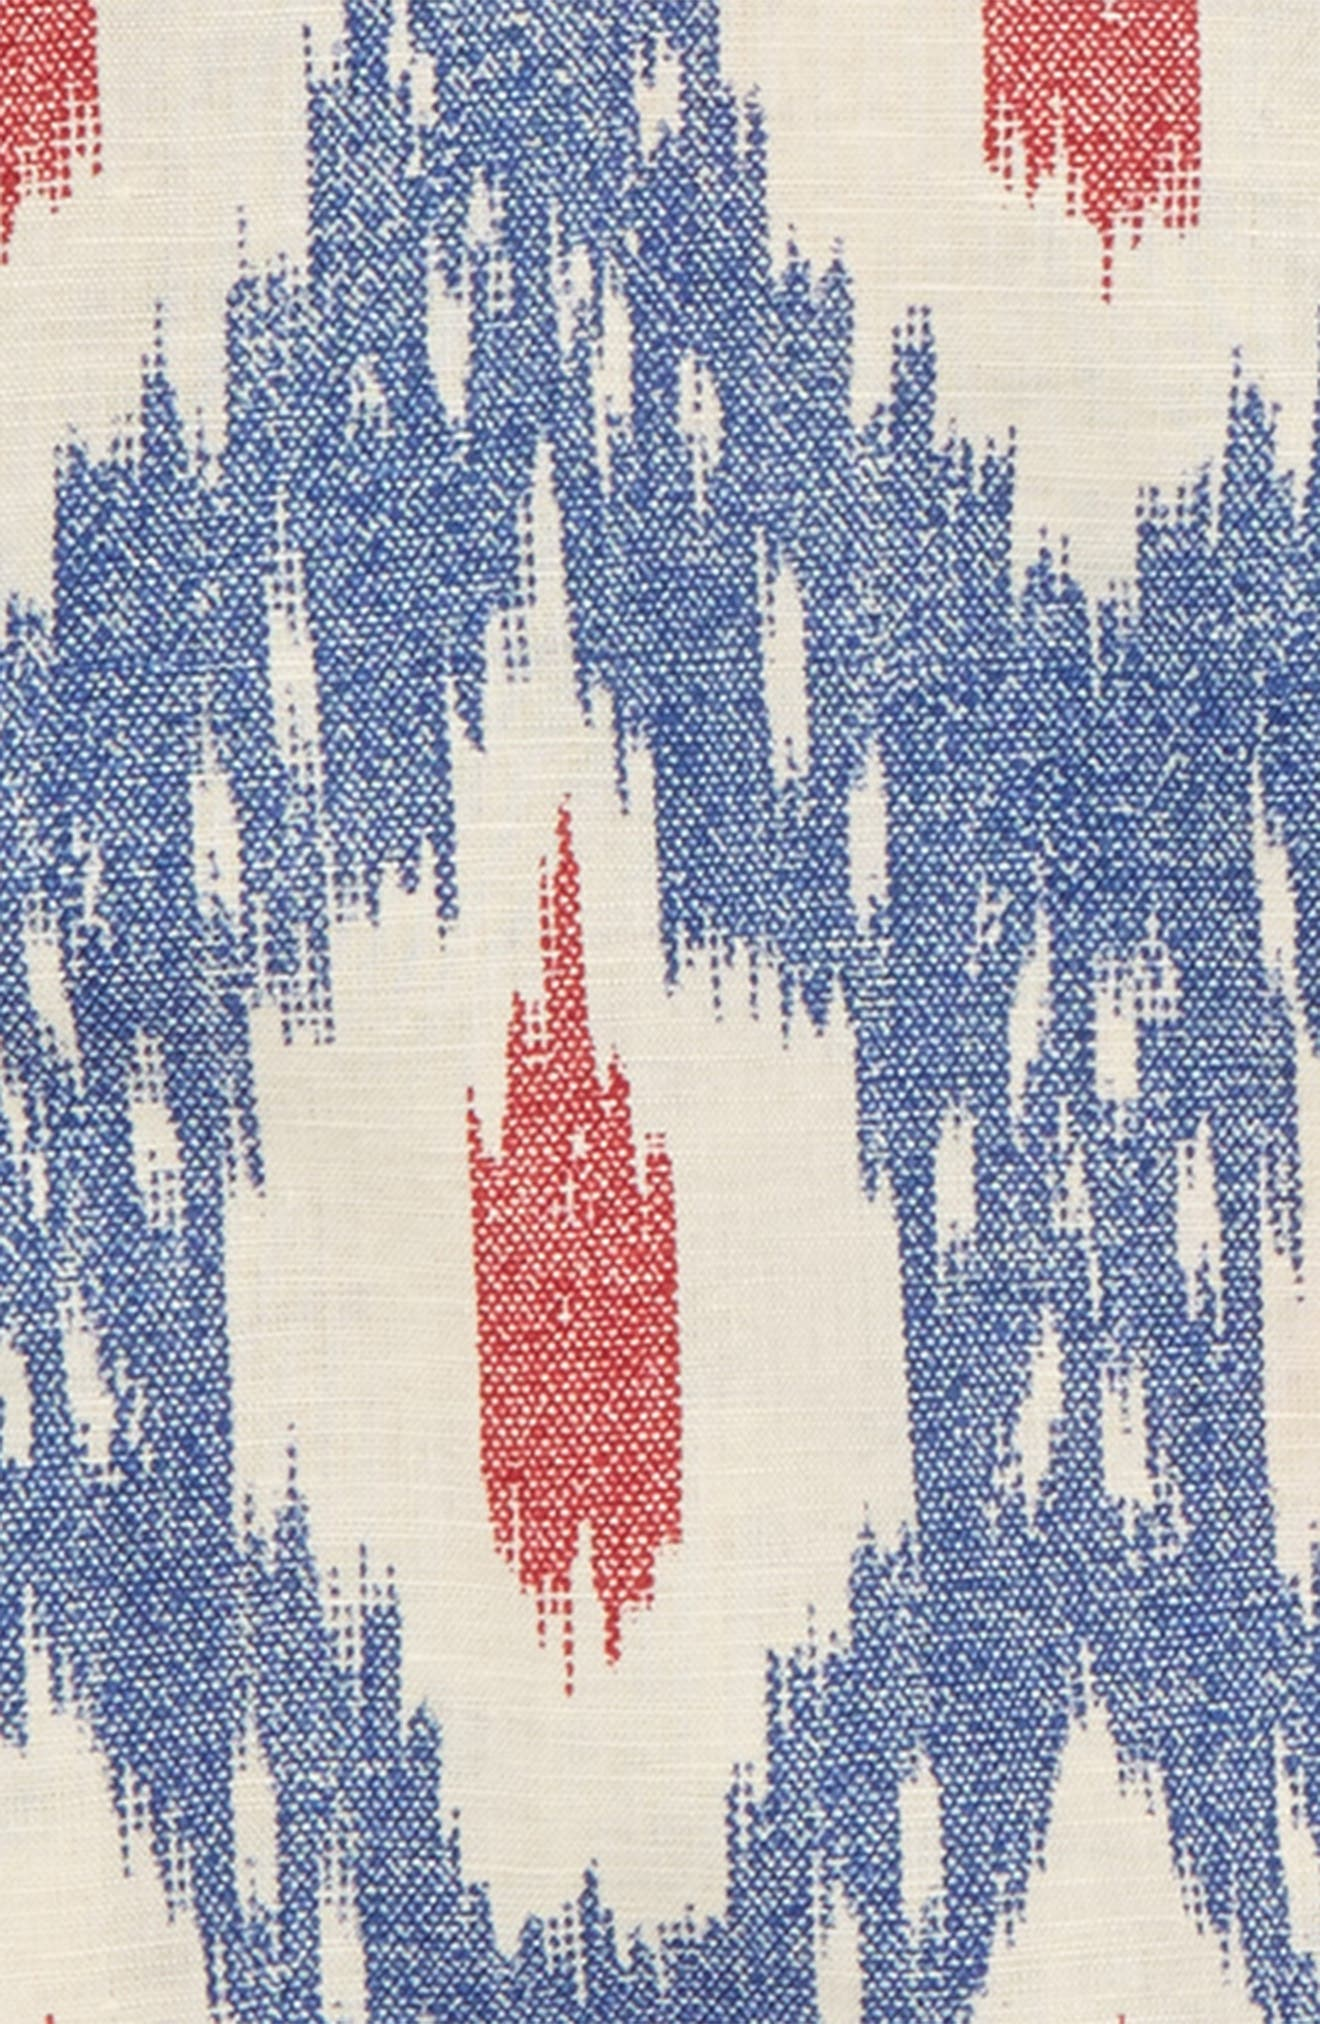 Ikat Print Popover Shirt,                             Alternate thumbnail 2, color,                             BLUE RED